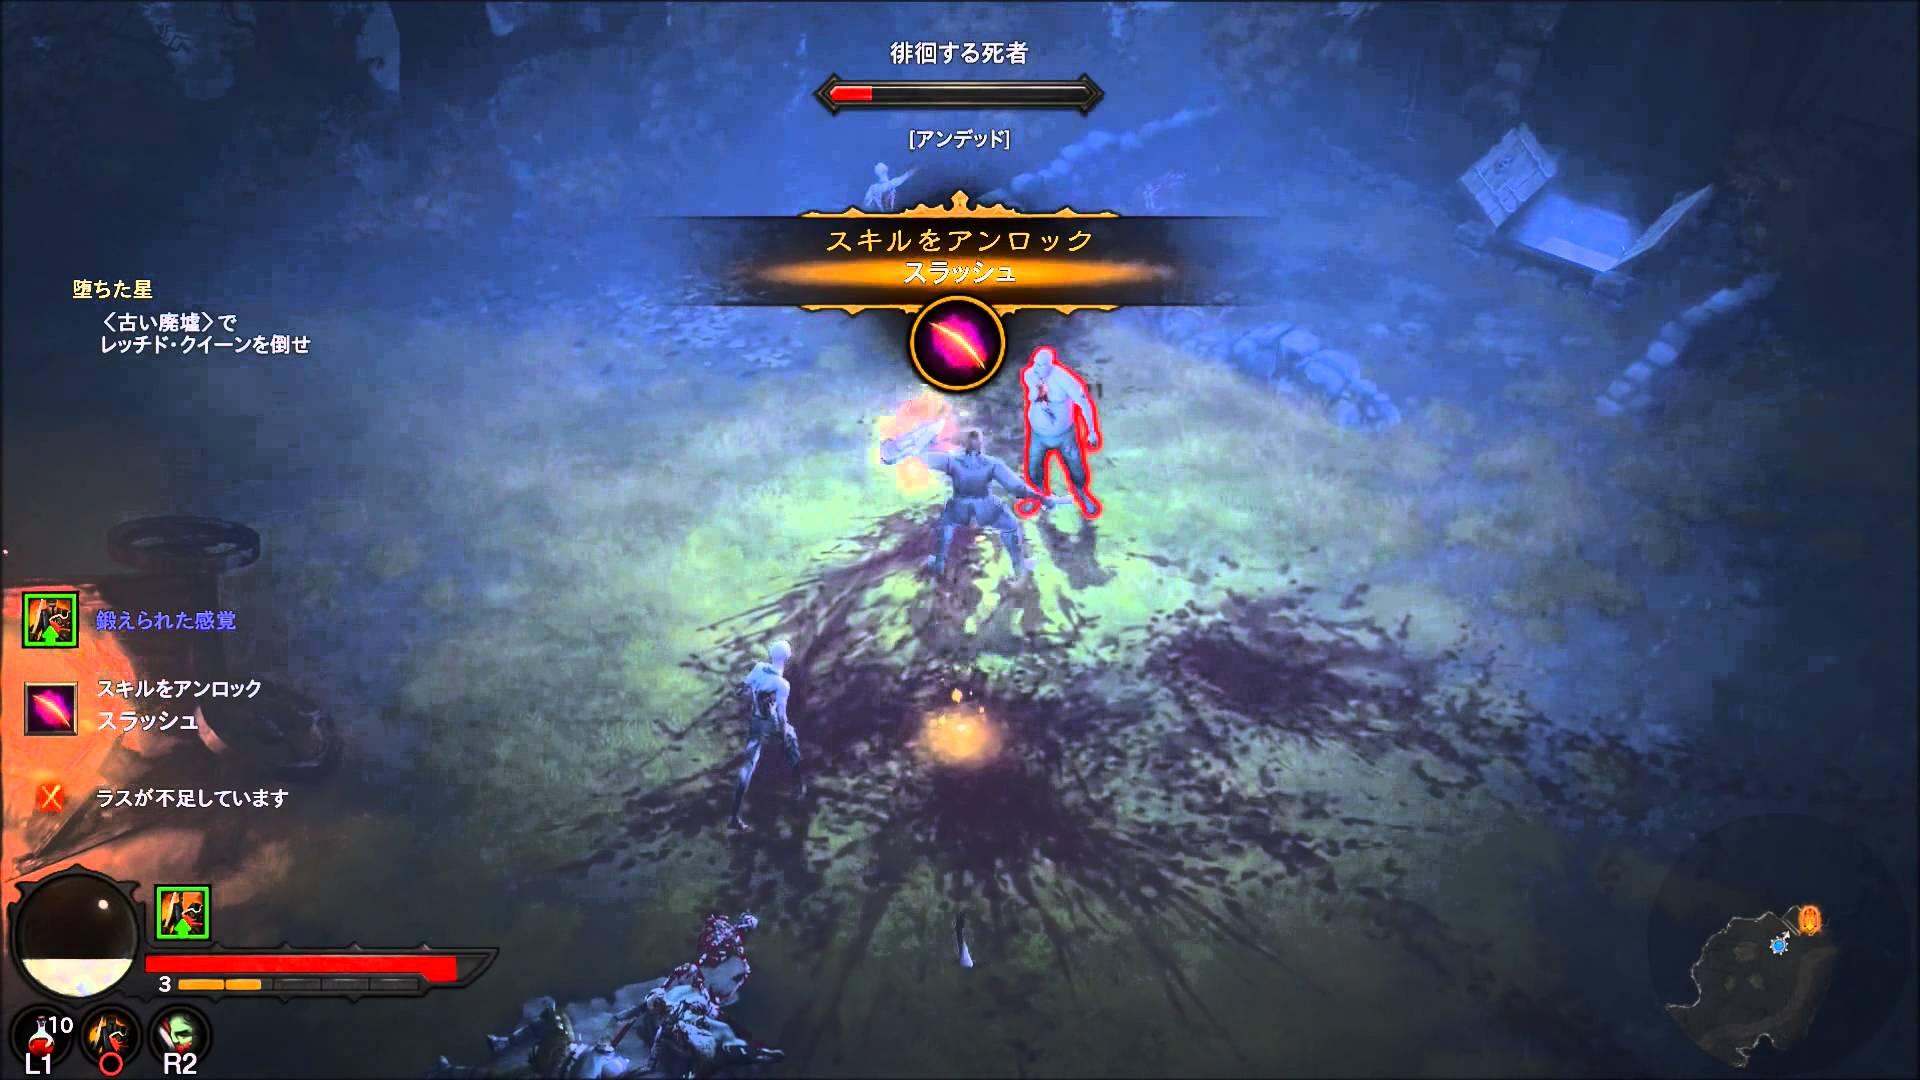 【PS4】ディアブロ III リーパー オブ ソウルズ ULTIMATE EVIL EDITION